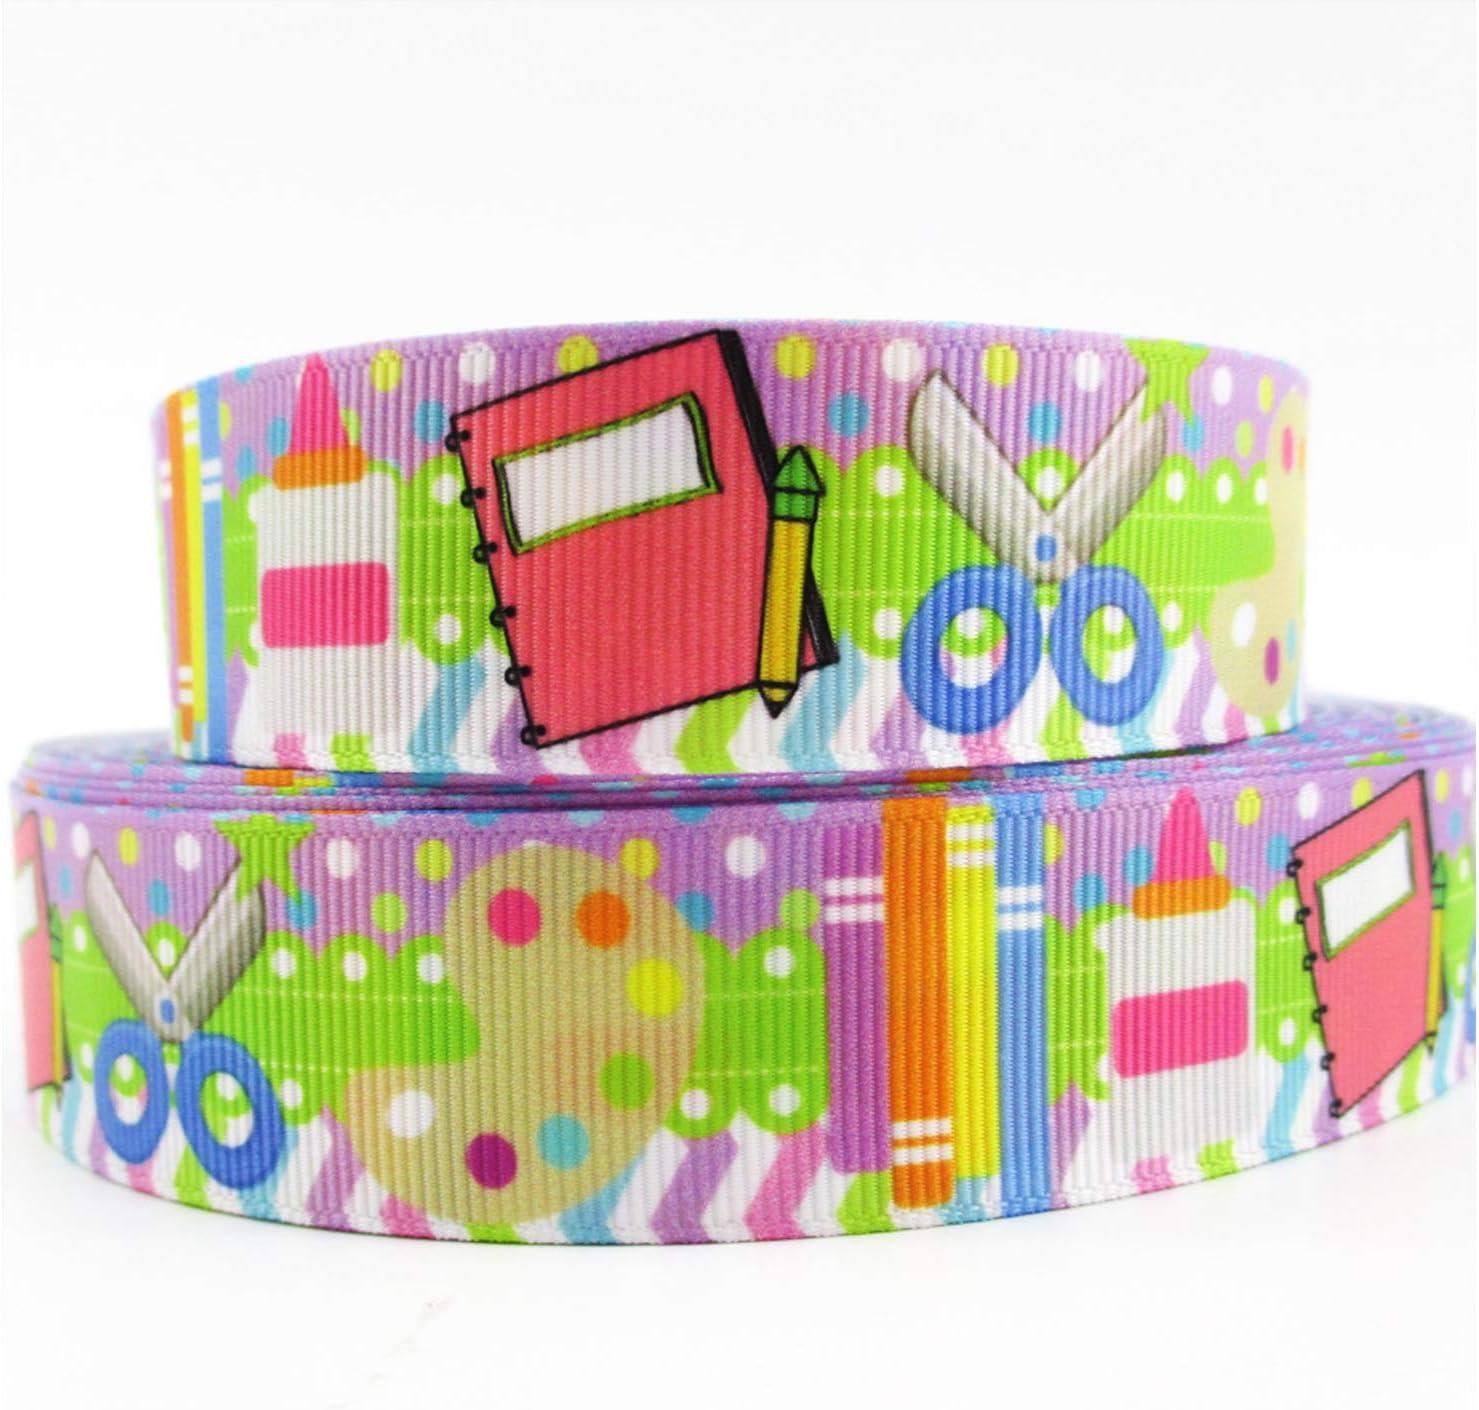 Back To School Ribbon Decorations - 10 Yard Long   Teacher Ribbon For Classroom   School Themed Ribbon Decor   School Grosgrain Ribbon   ABC Ribbon For Crafts   Back To School Decorations Supplies